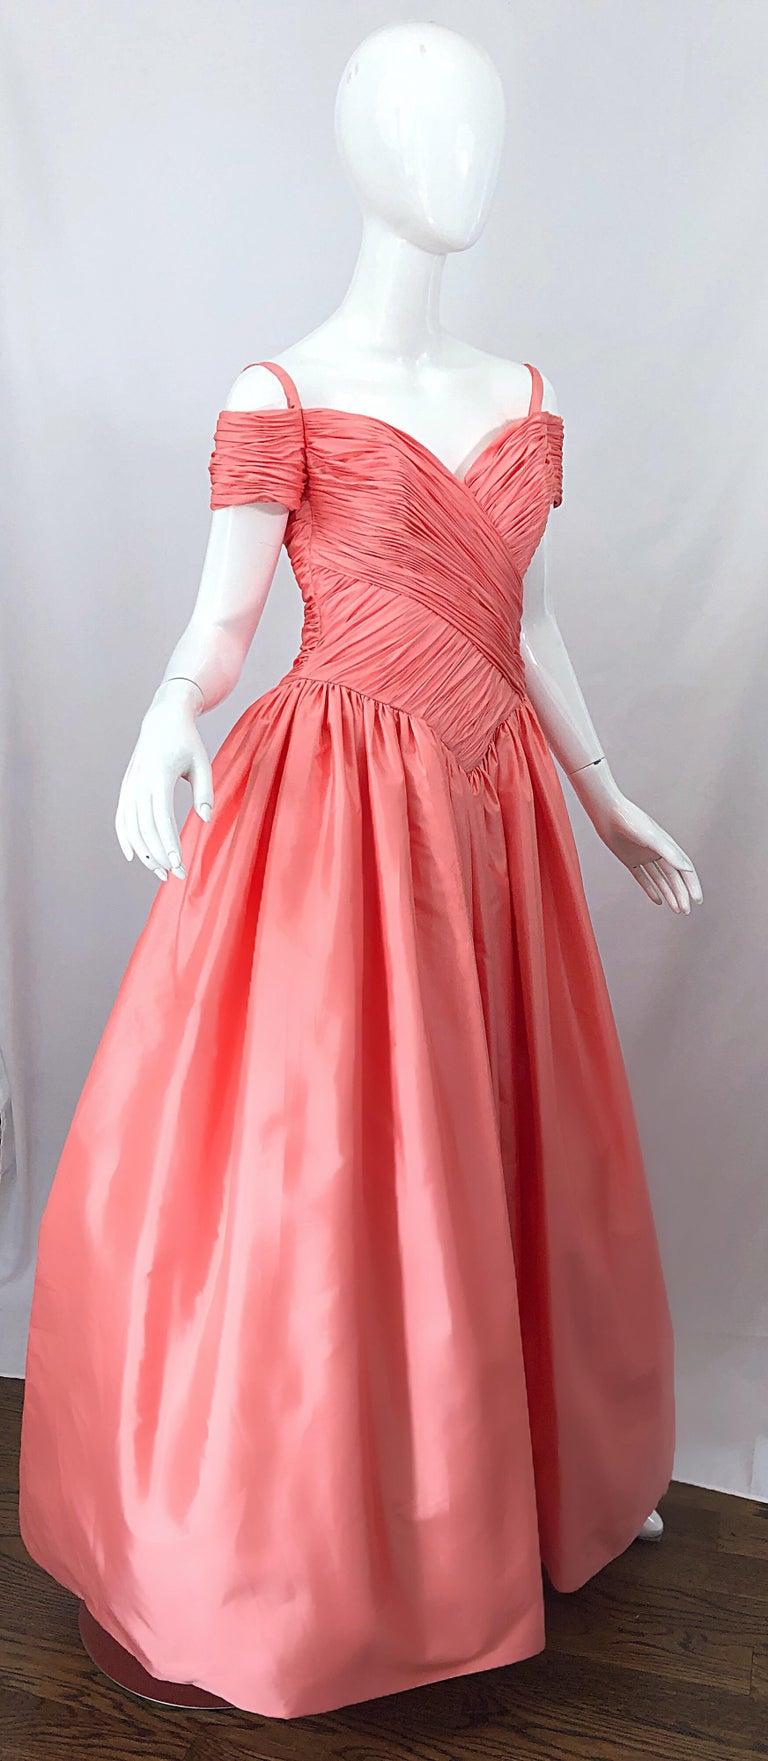 1980s Chris Kole Coral Pink Size 6 Off the Shoulder Silk Taffeta Vintage Gown For Sale 9